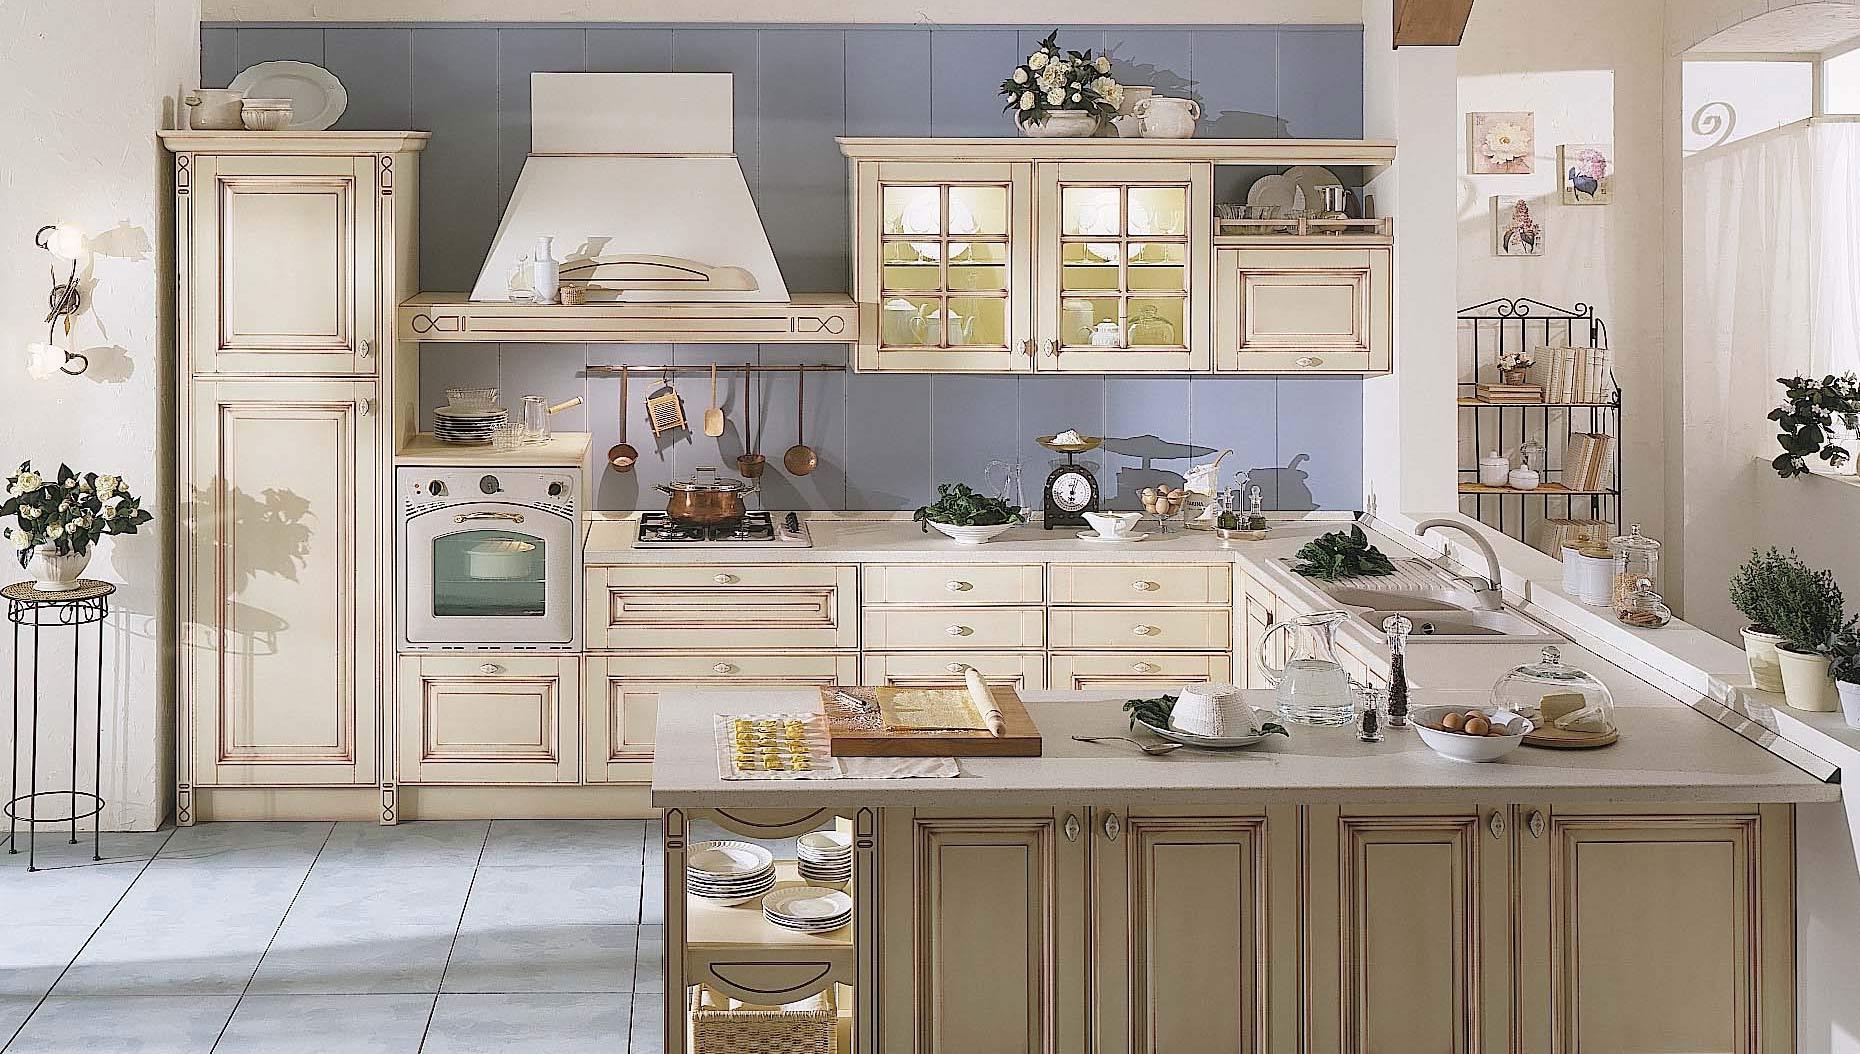 Best Cucina Stile Coloniale Photos - Design & Ideas 2017 - candp.us